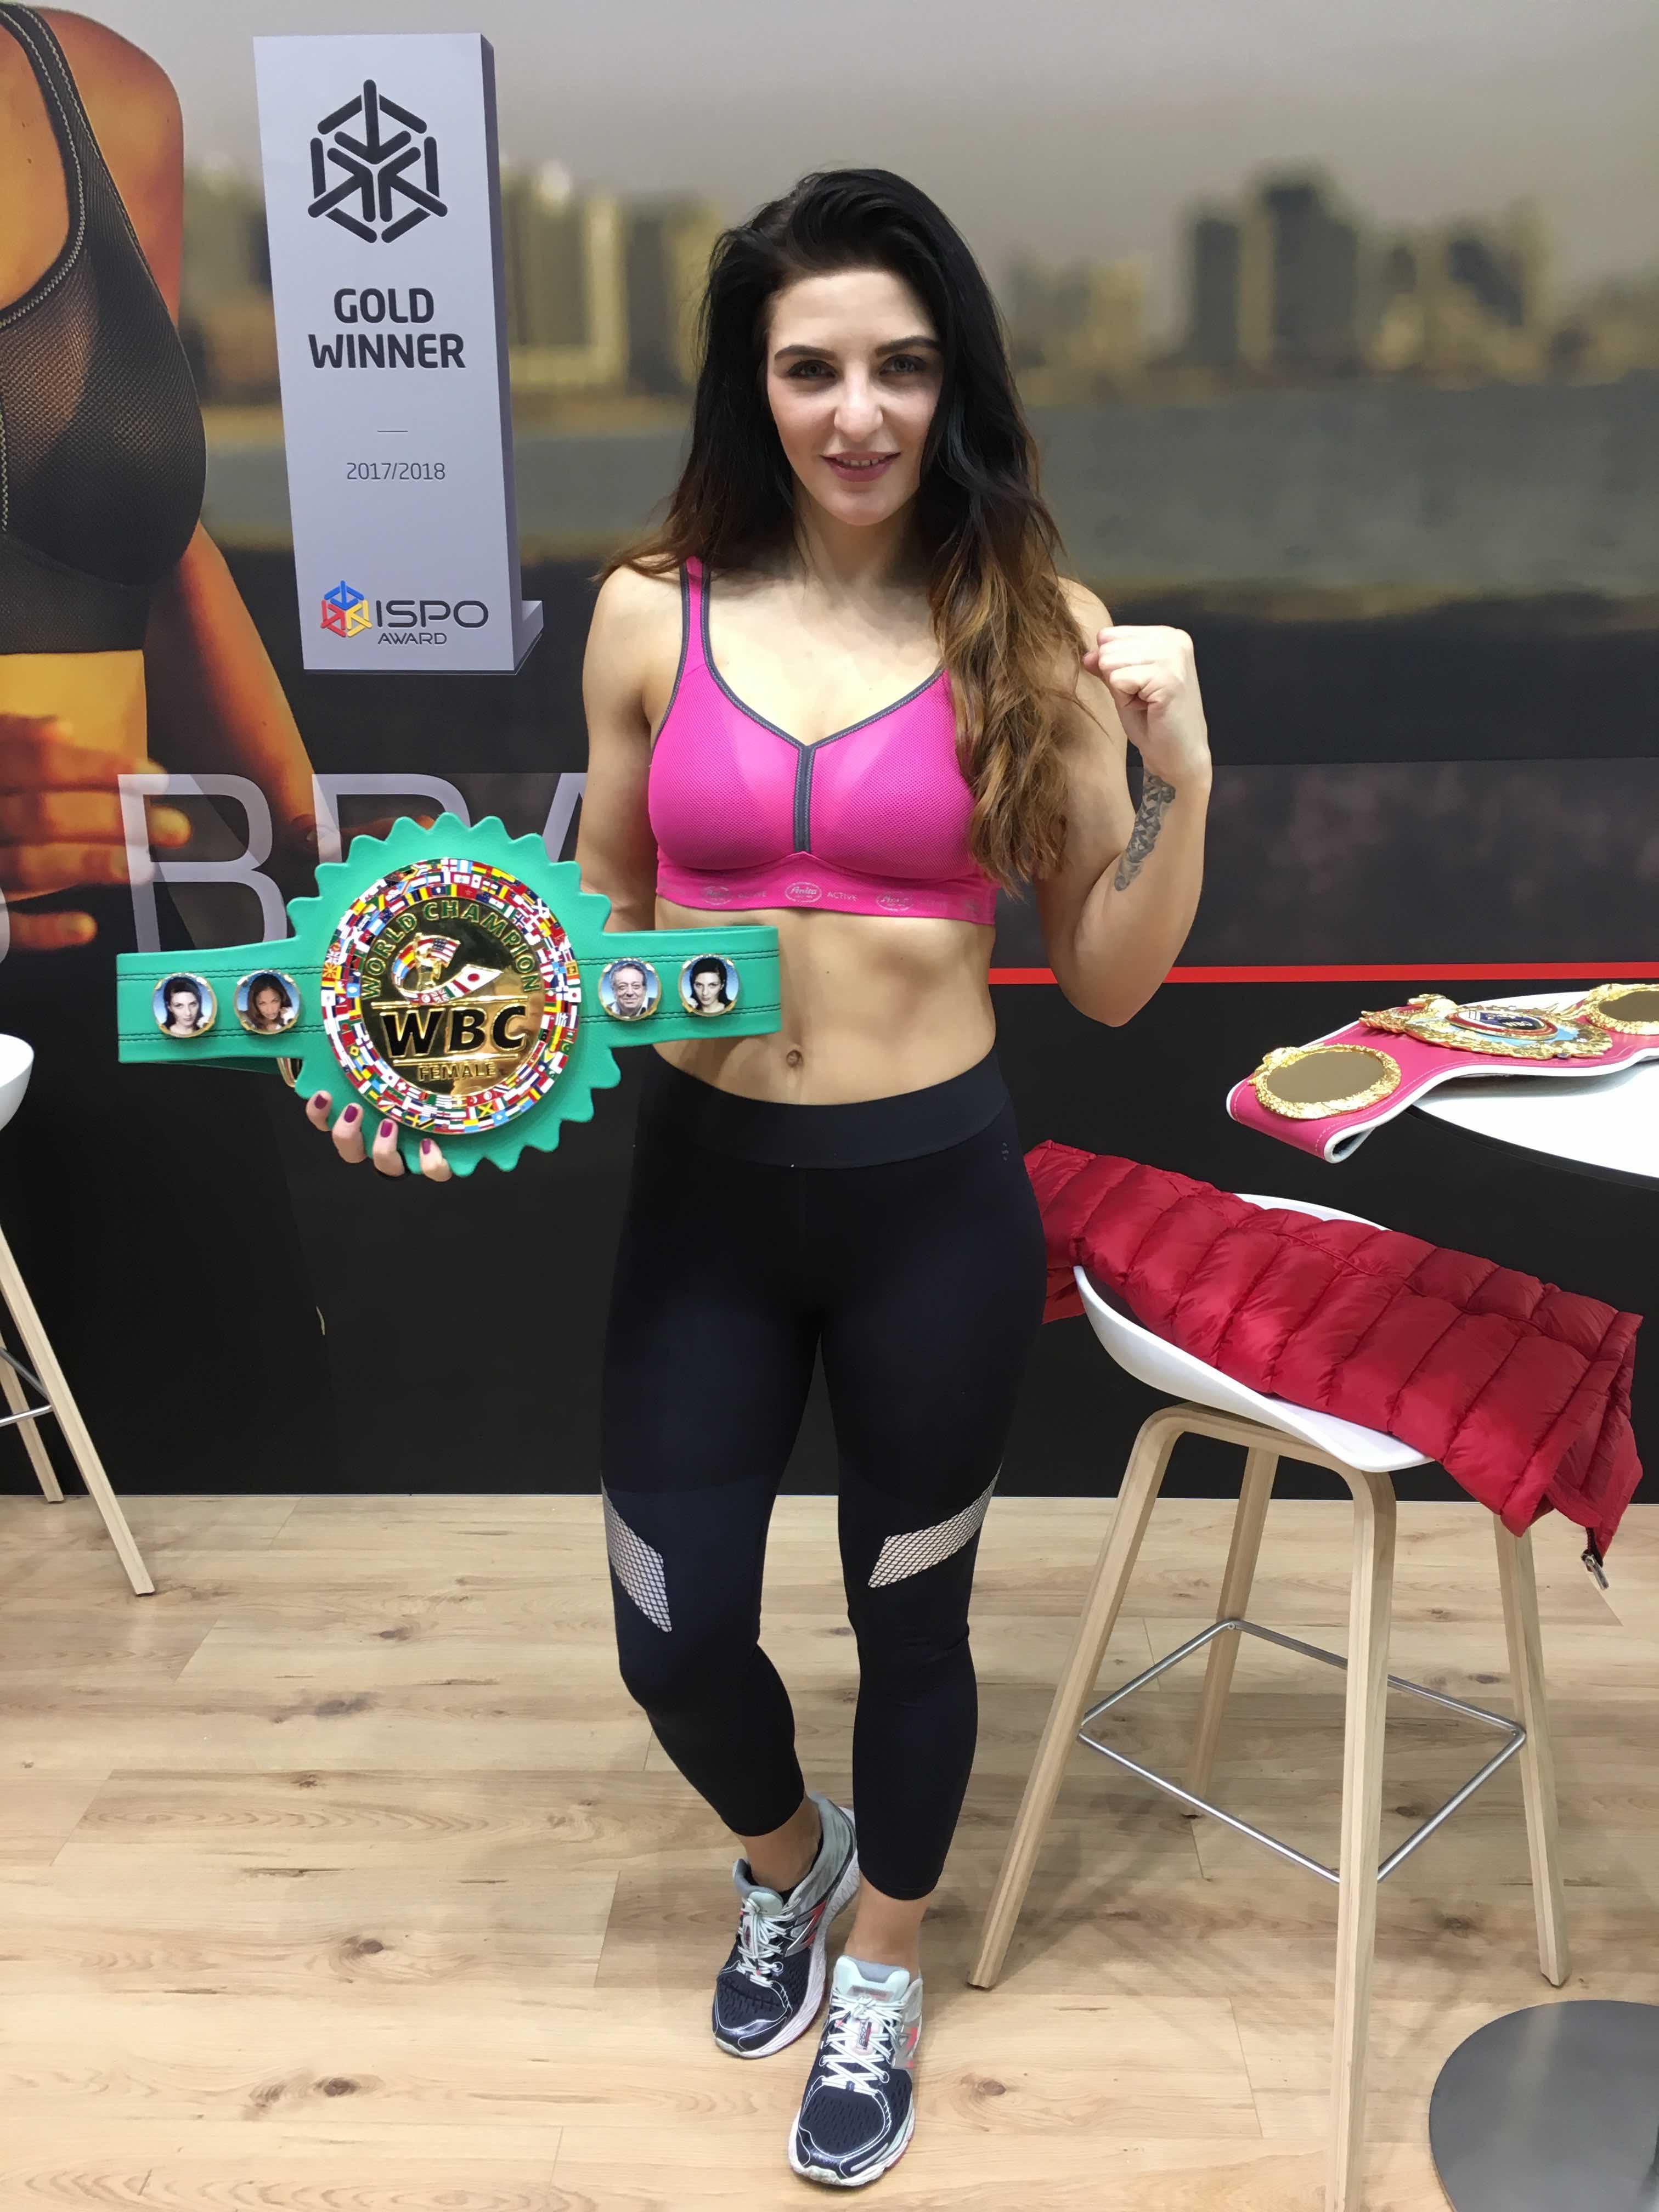 Christina-Hammer-Boxweltmeisterin-Interview-Fitnessblog-1